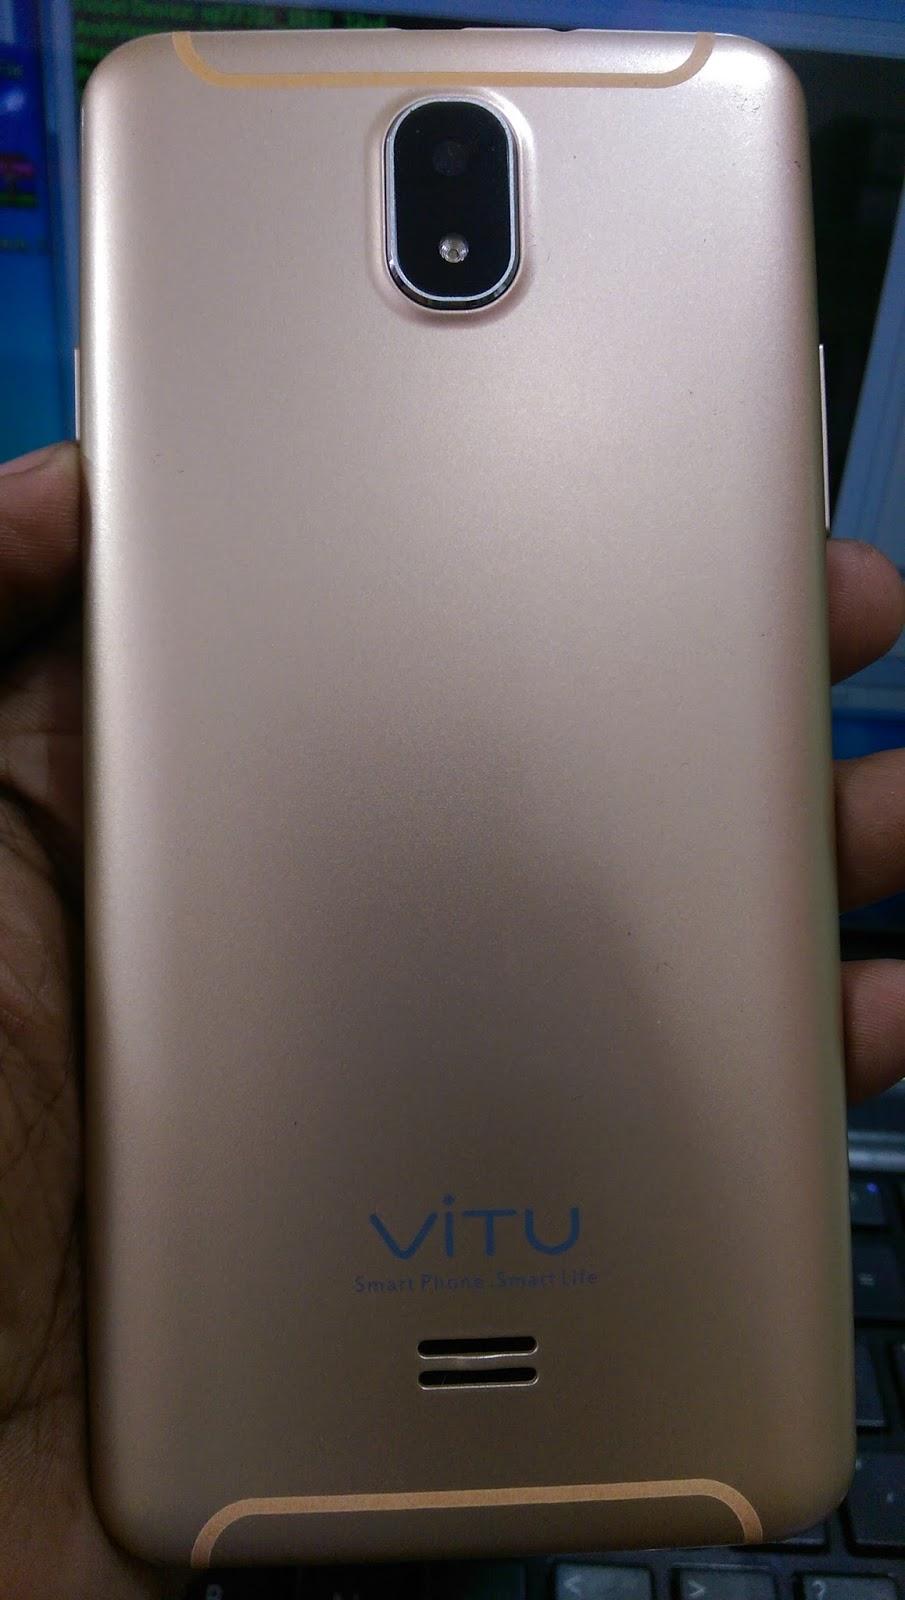 Vitu V2 Flash File